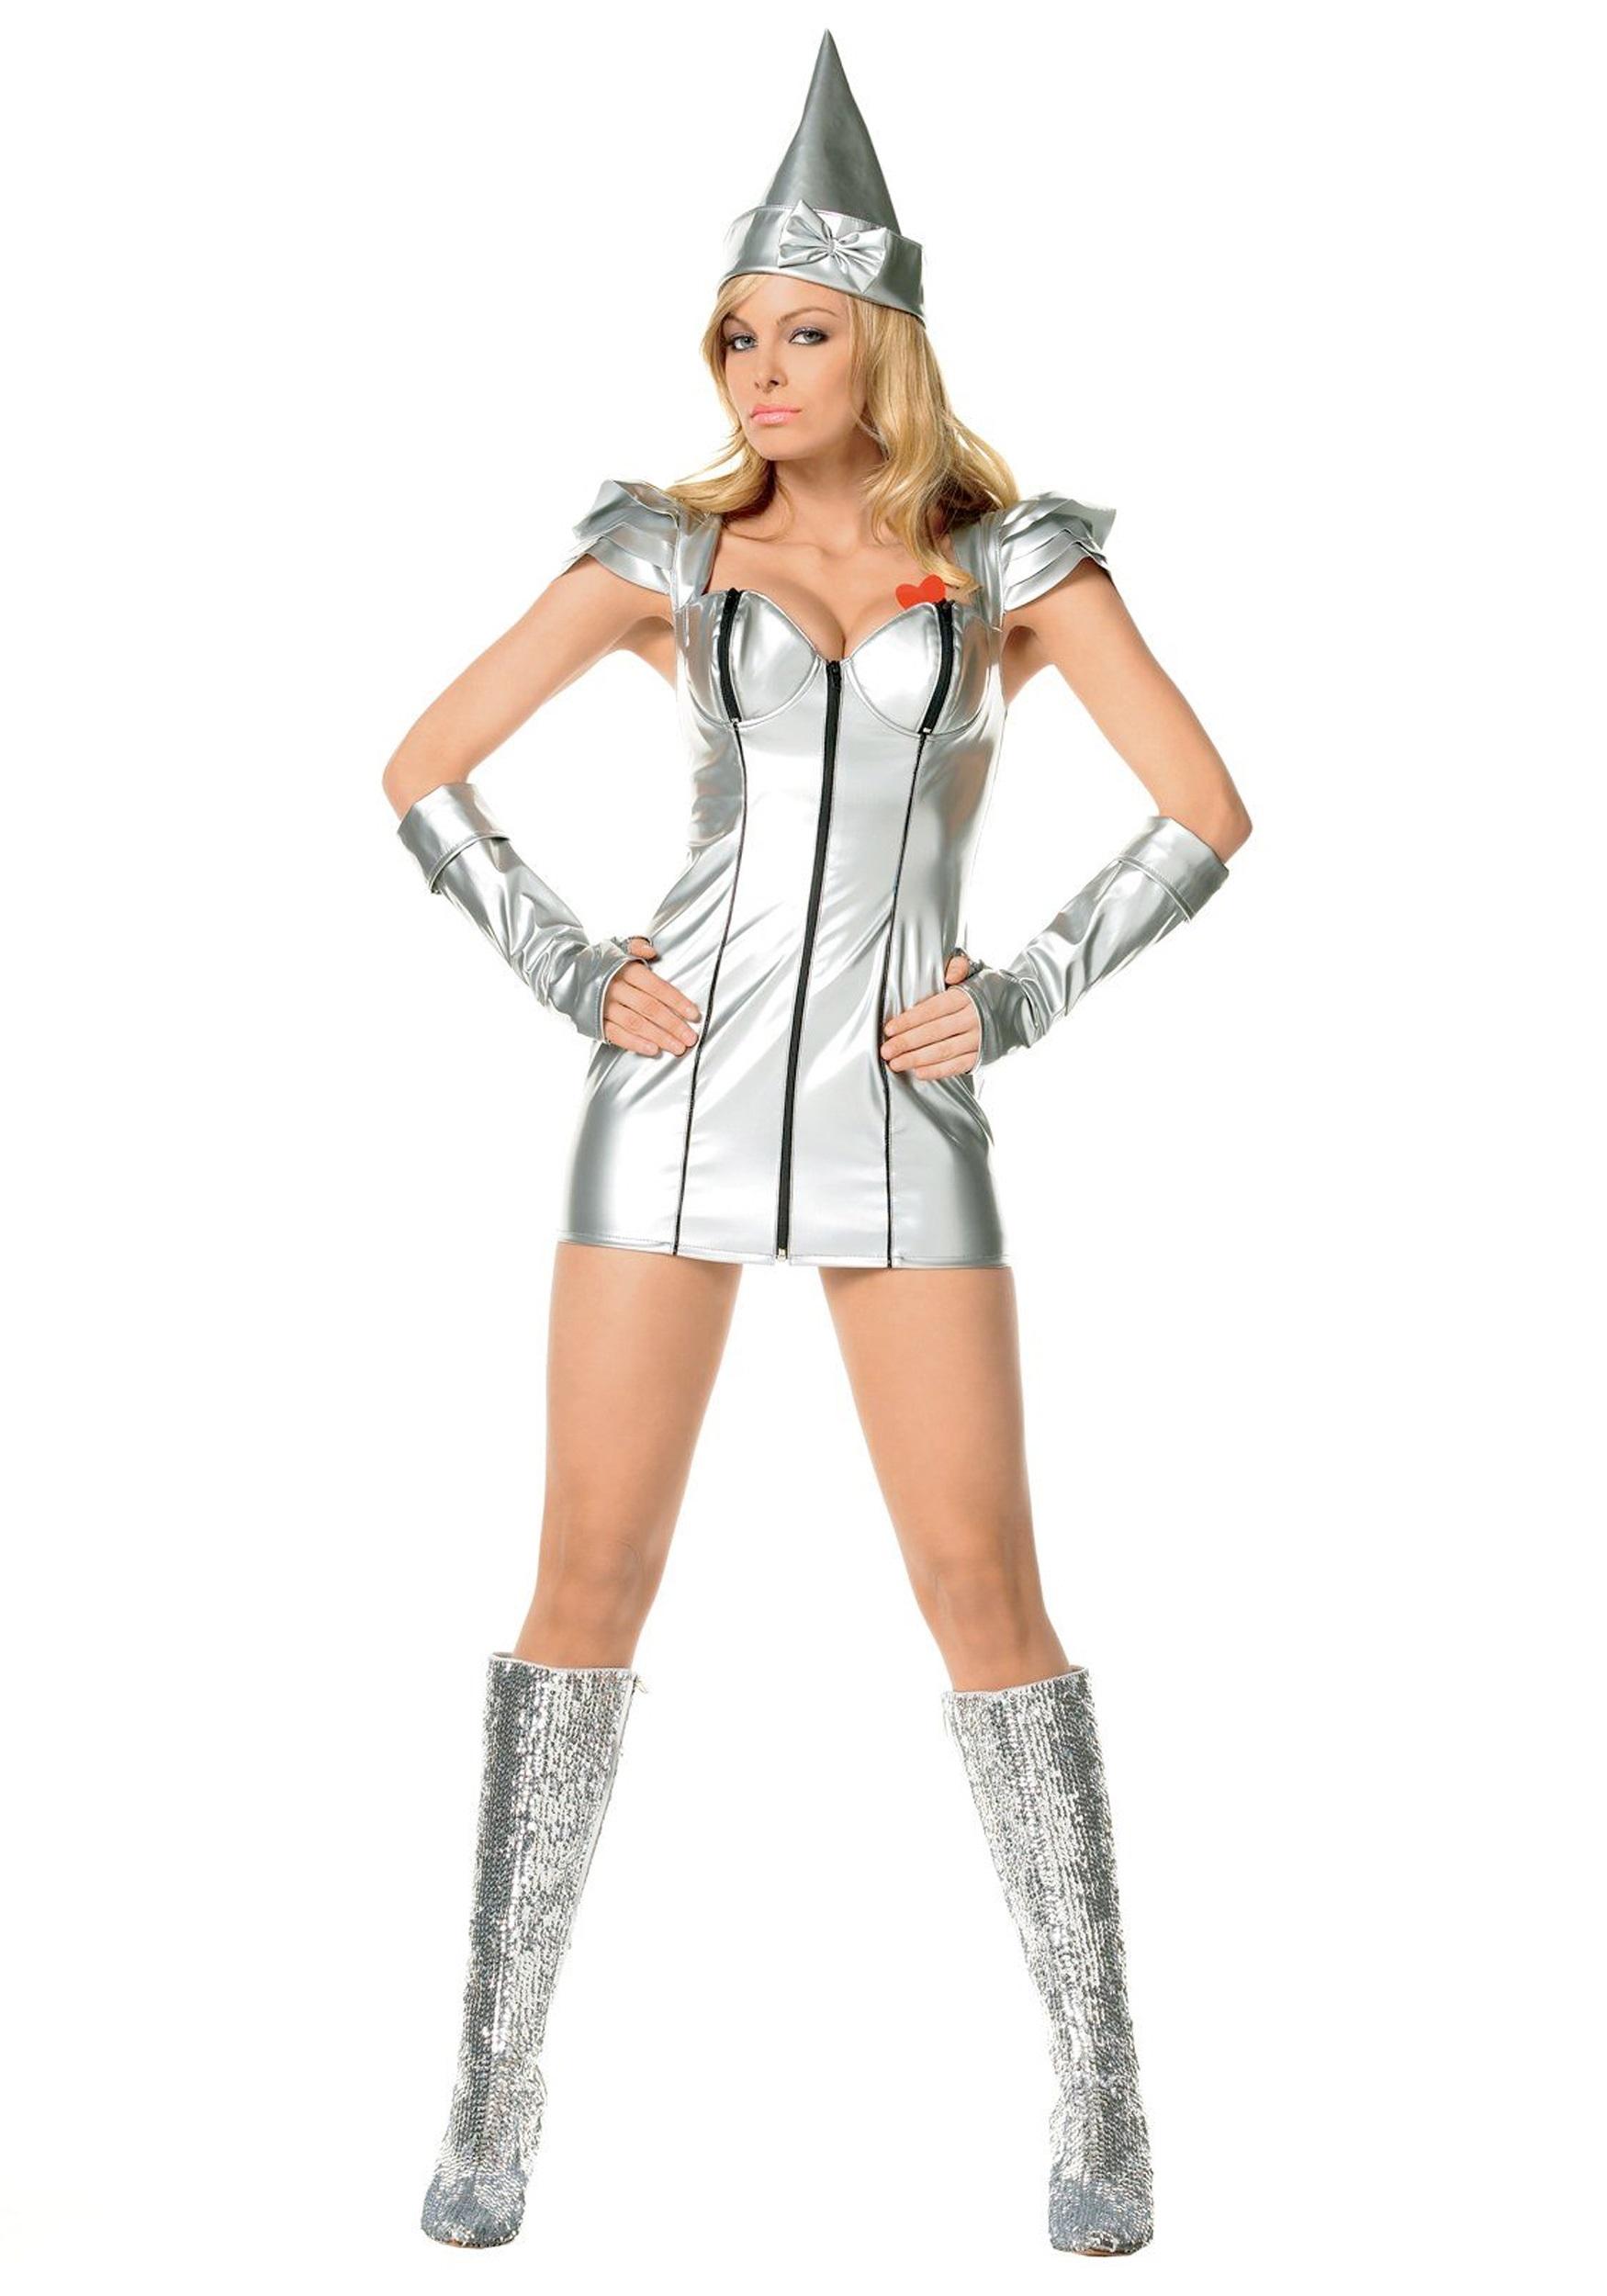 15 costume sale blowout at backward glances